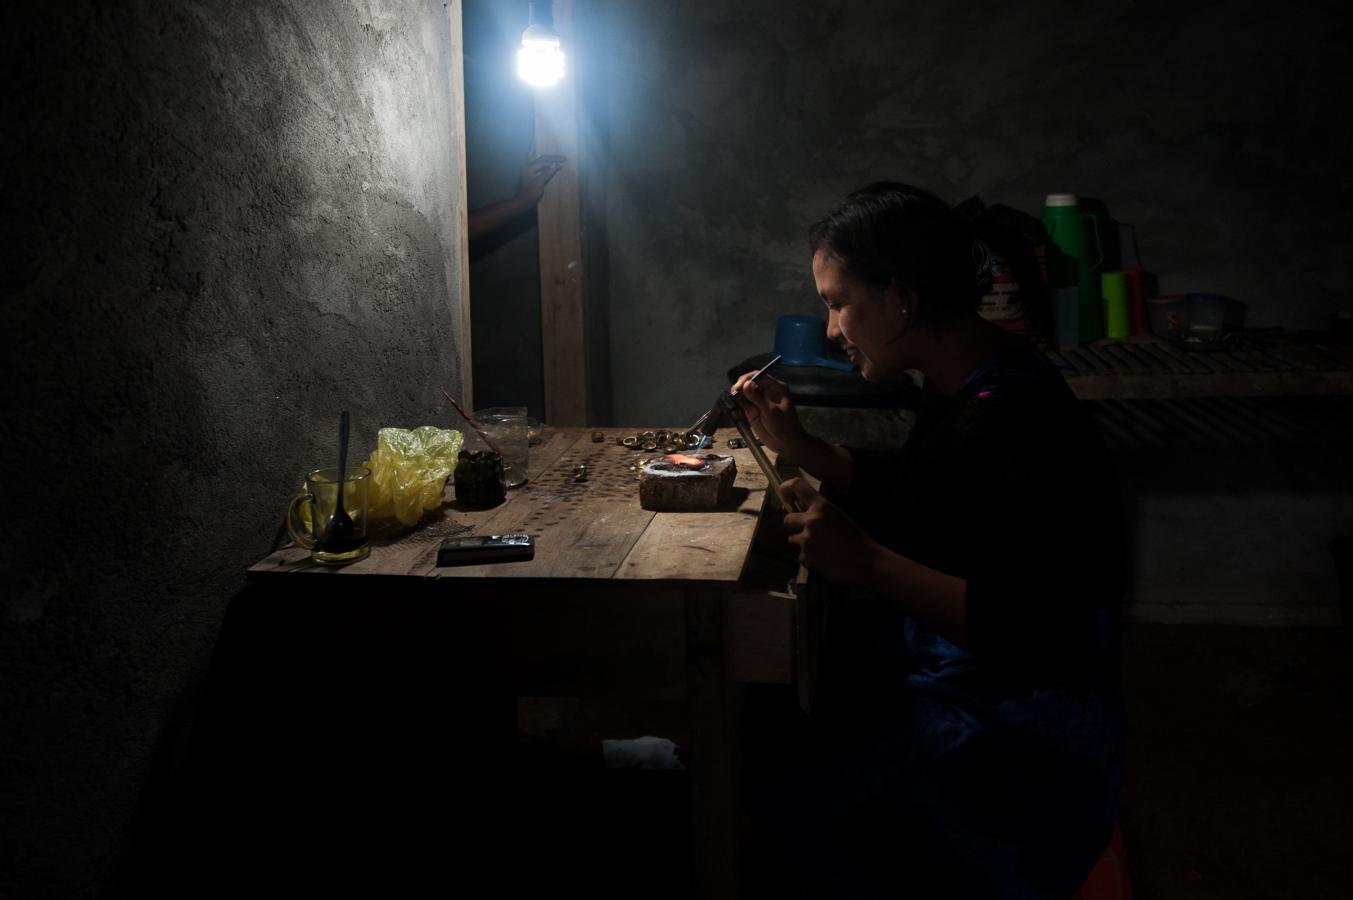 woman-making-silver-beads-somewhere-around-sidemen-bali-2010